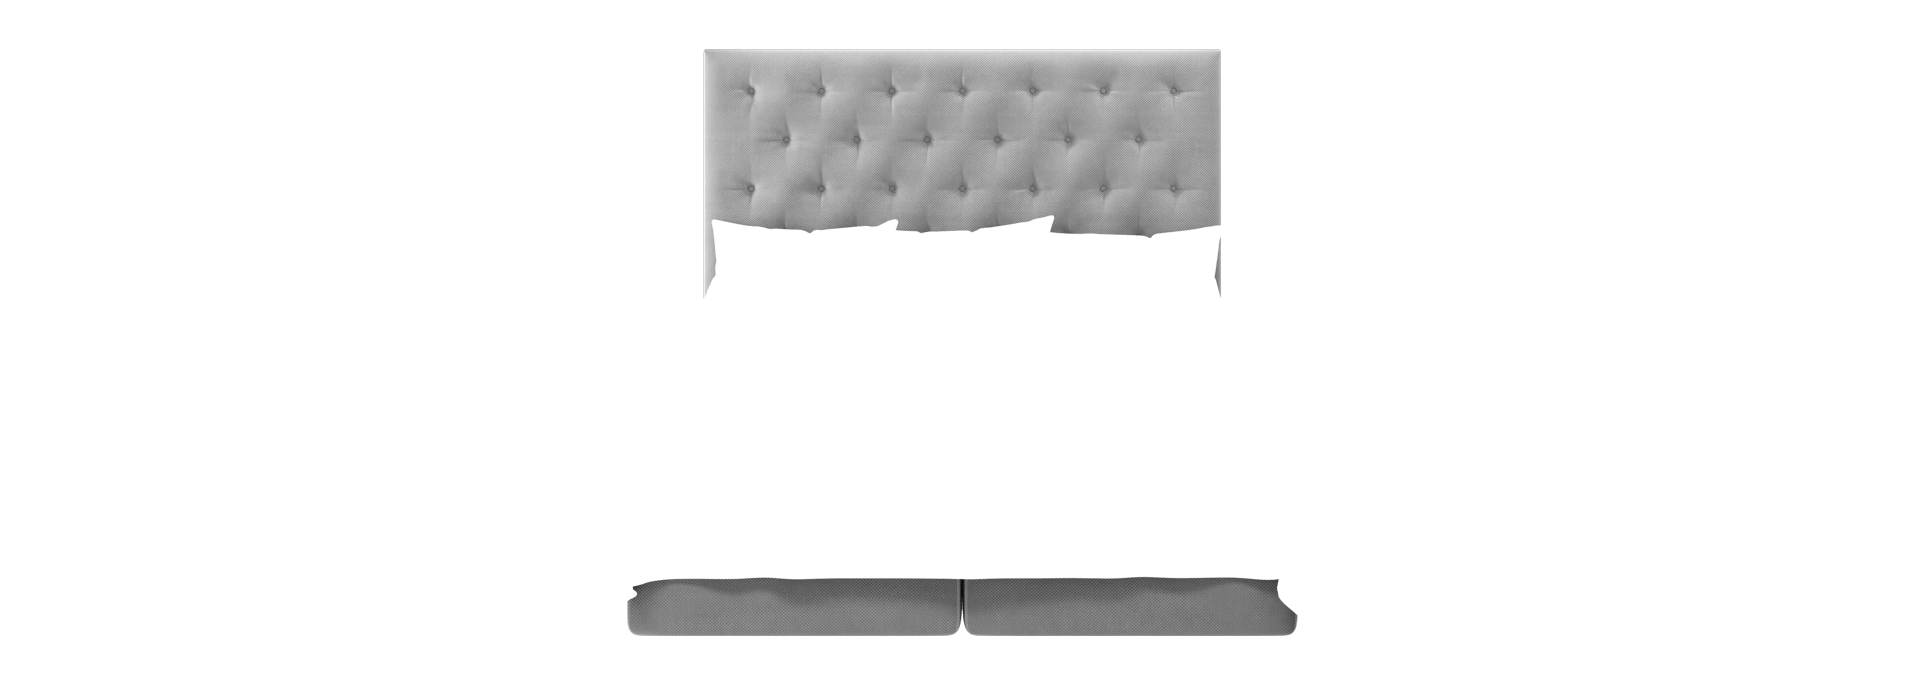 Естер 1.6 ліжко box spring - маска 3